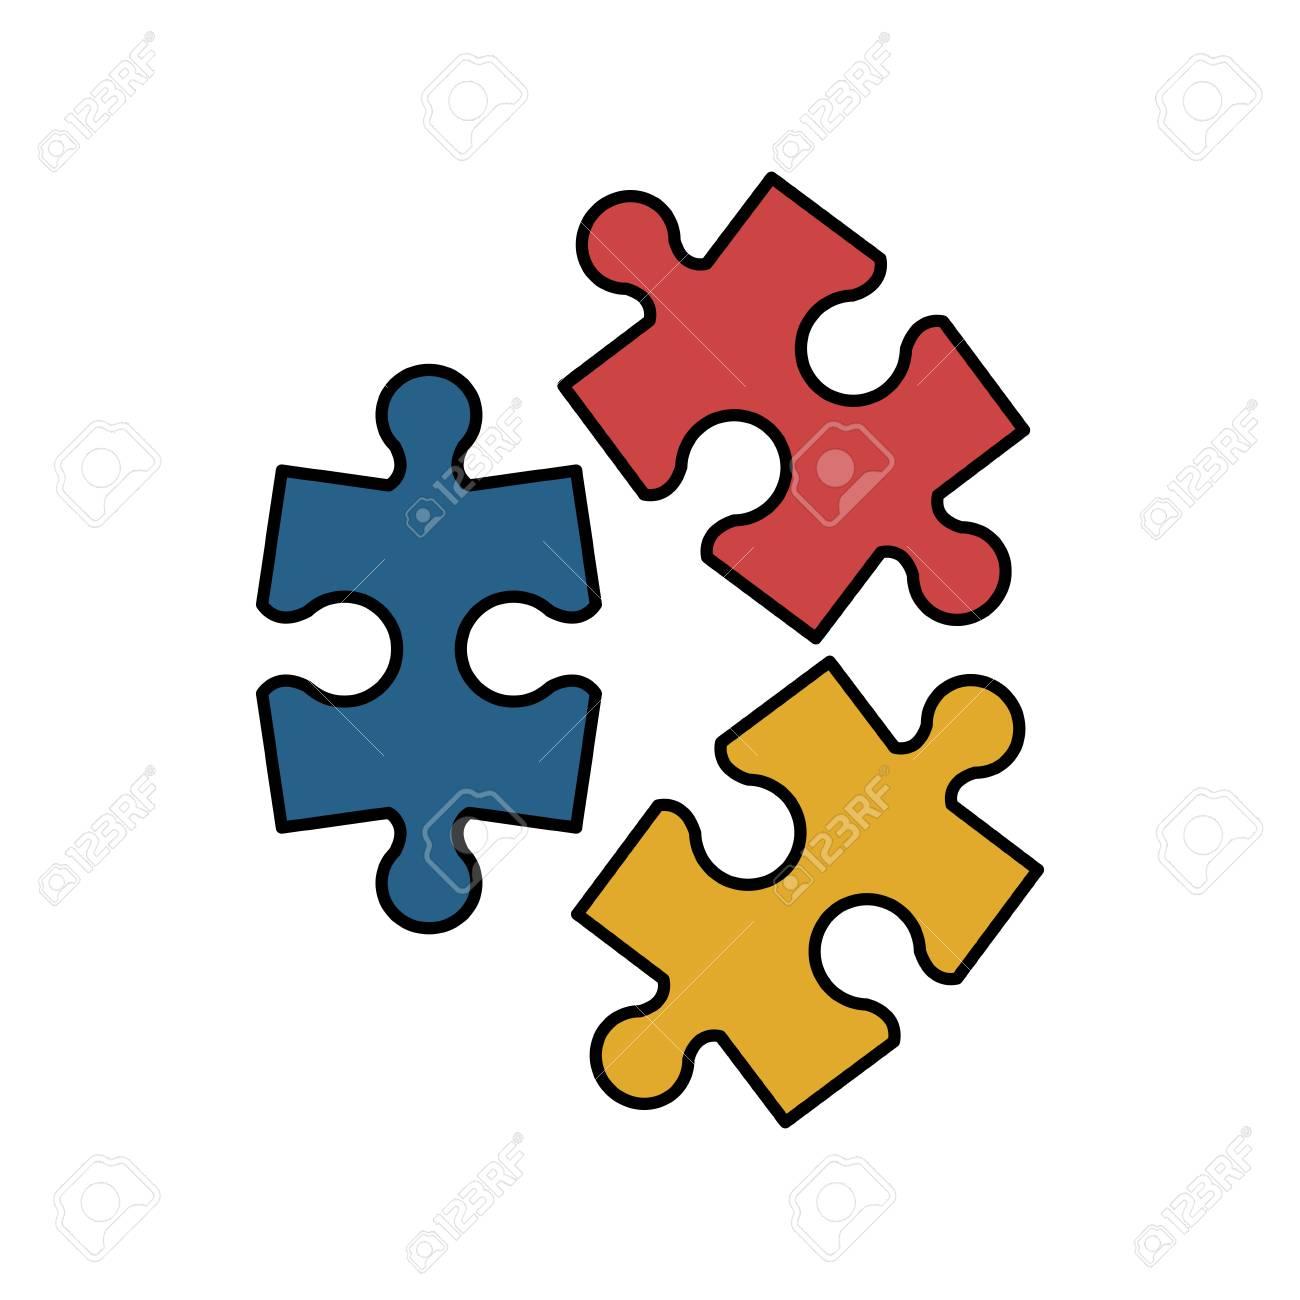 puzzle pieces icon image vector illustration design royalty free rh 123rf com puzzle pieces vector black and white puzzle pieces vector art free